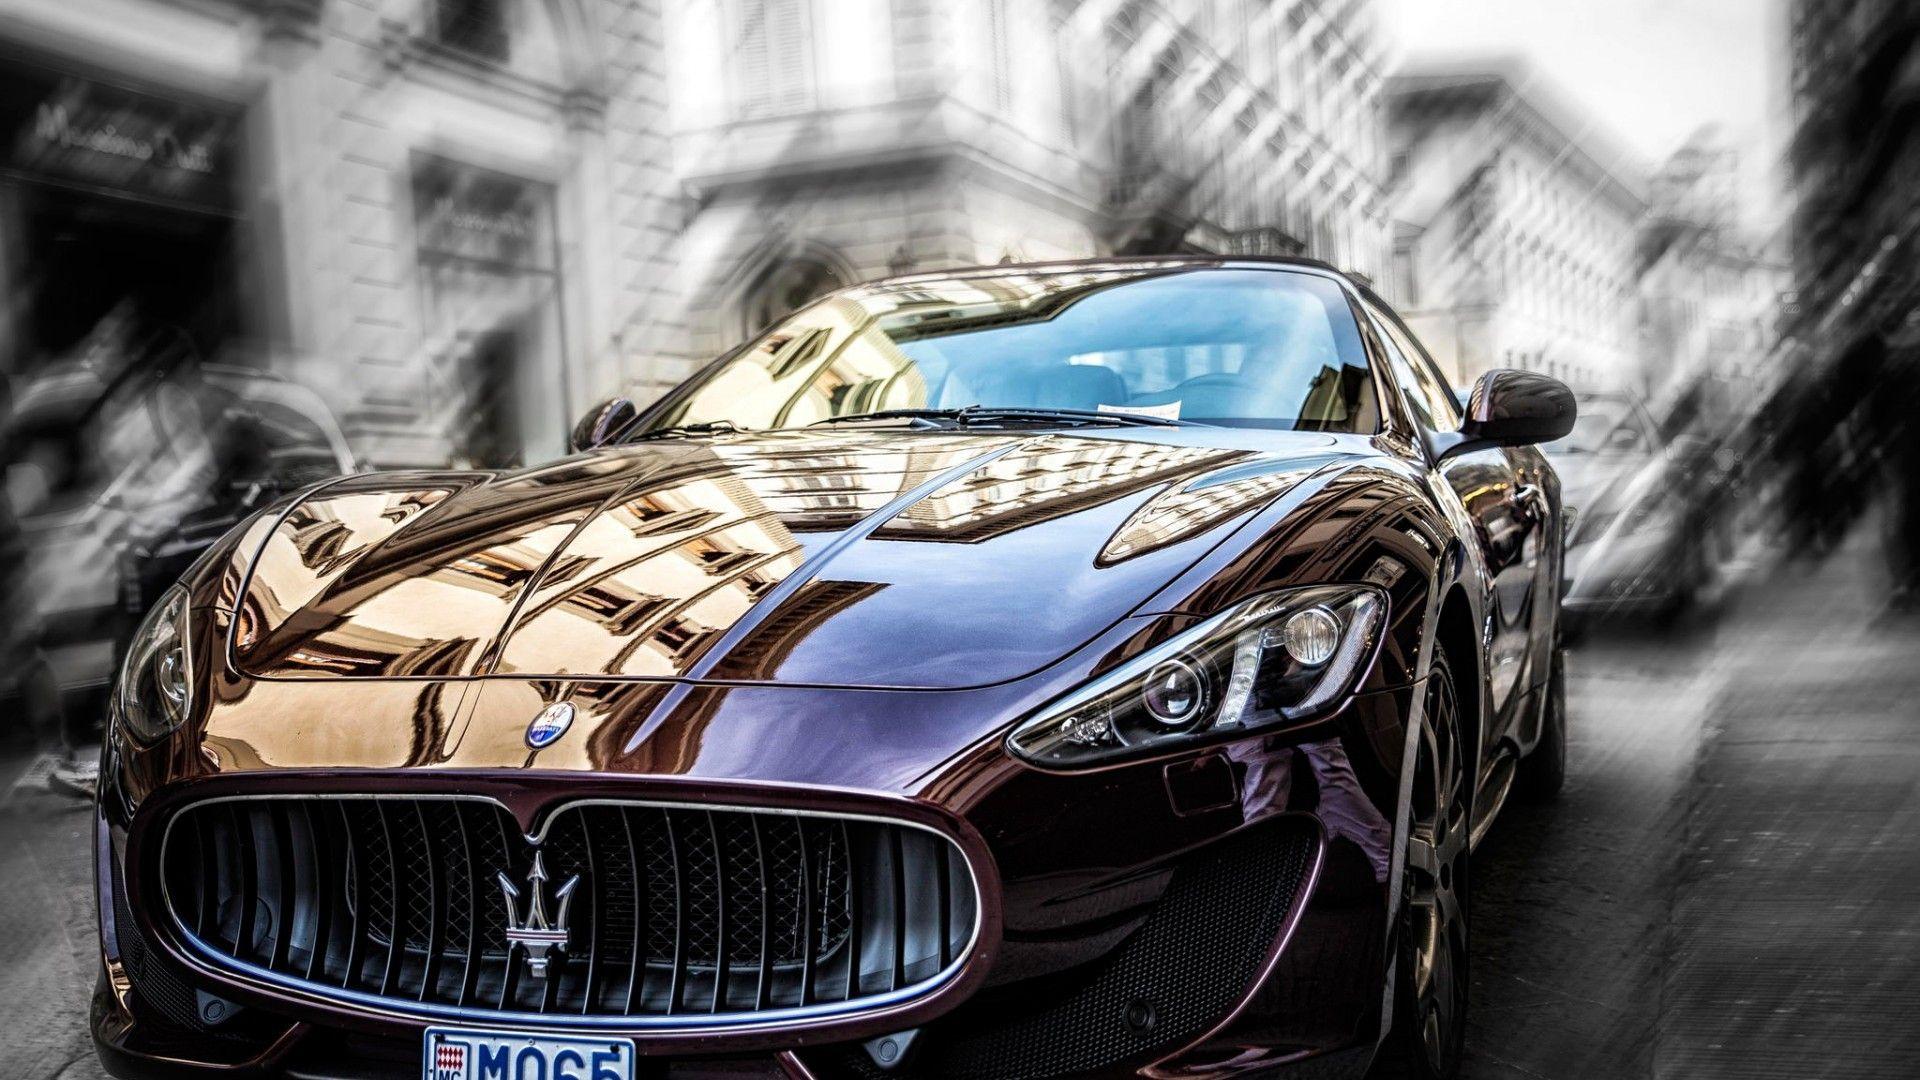 Wallpaper Maserati